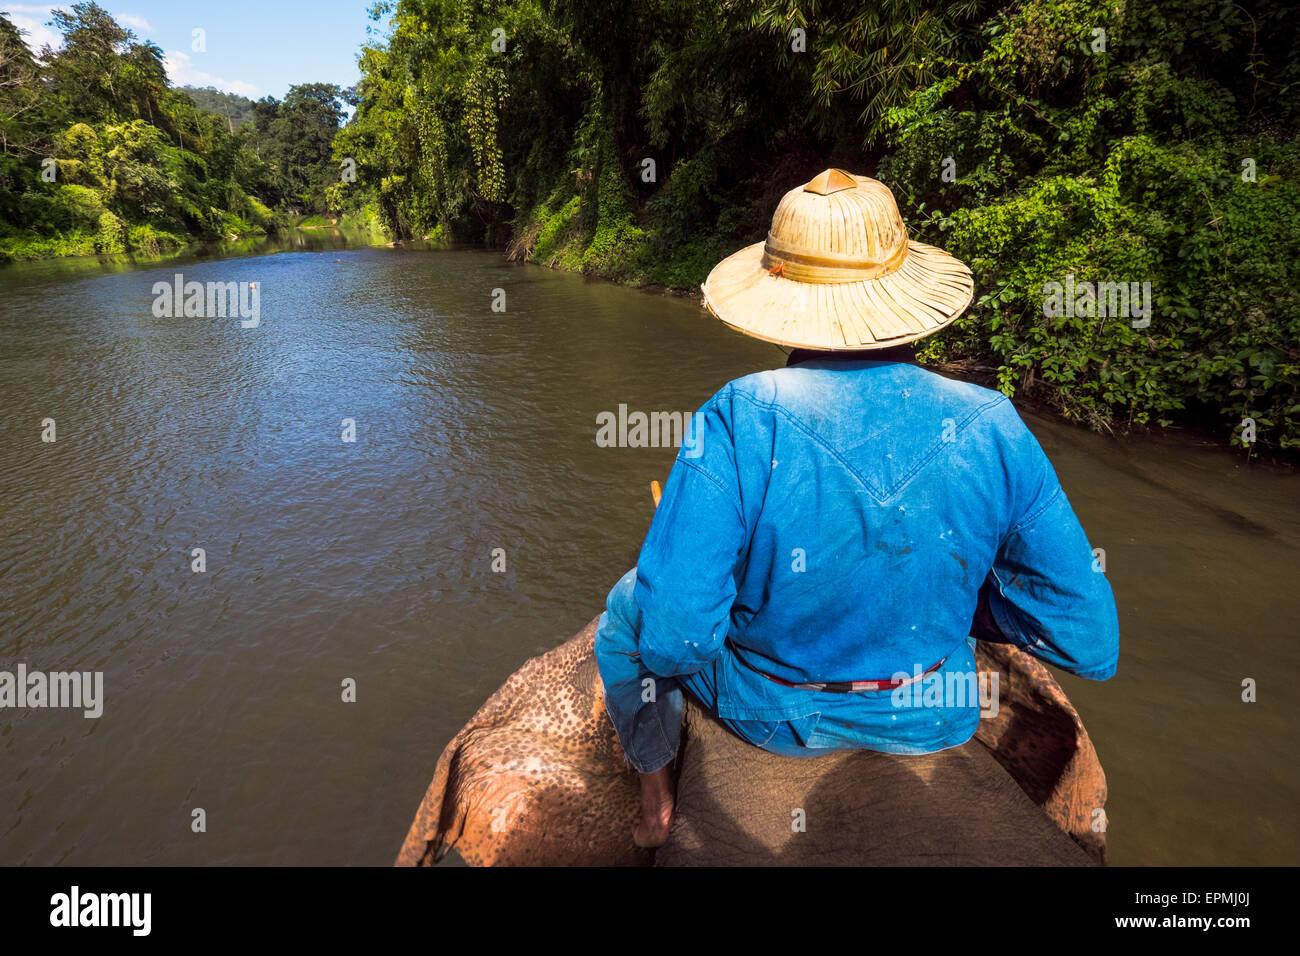 Asia. Thailand, Chiang Dao. Elephant center. Elephant trekking. - Stock Image